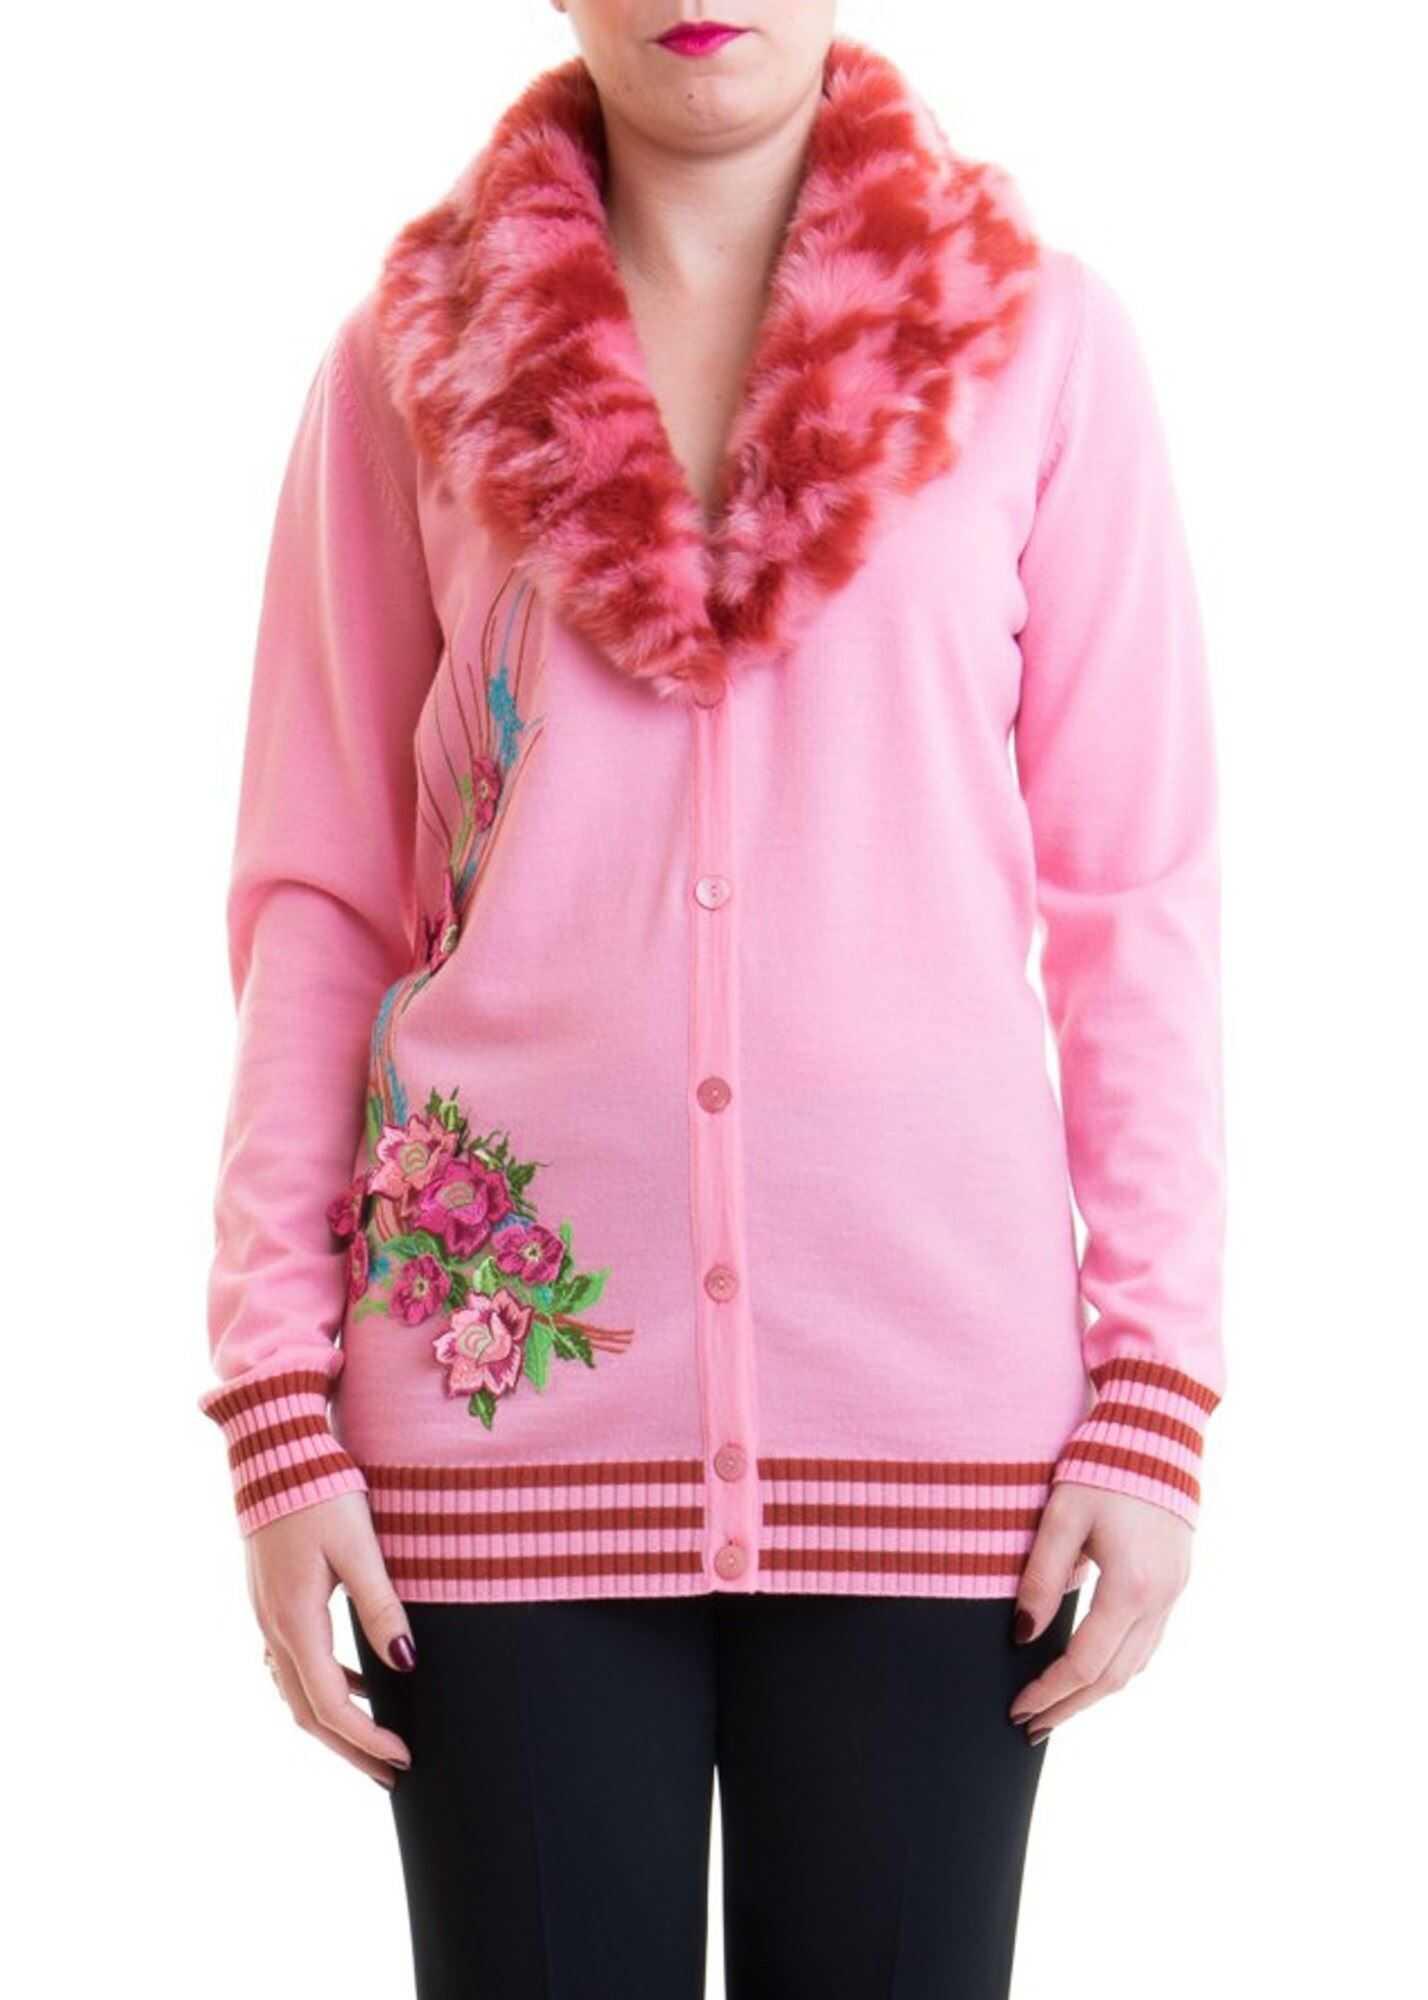 Blumarine Cardigan With Faux Fur Collar Pink